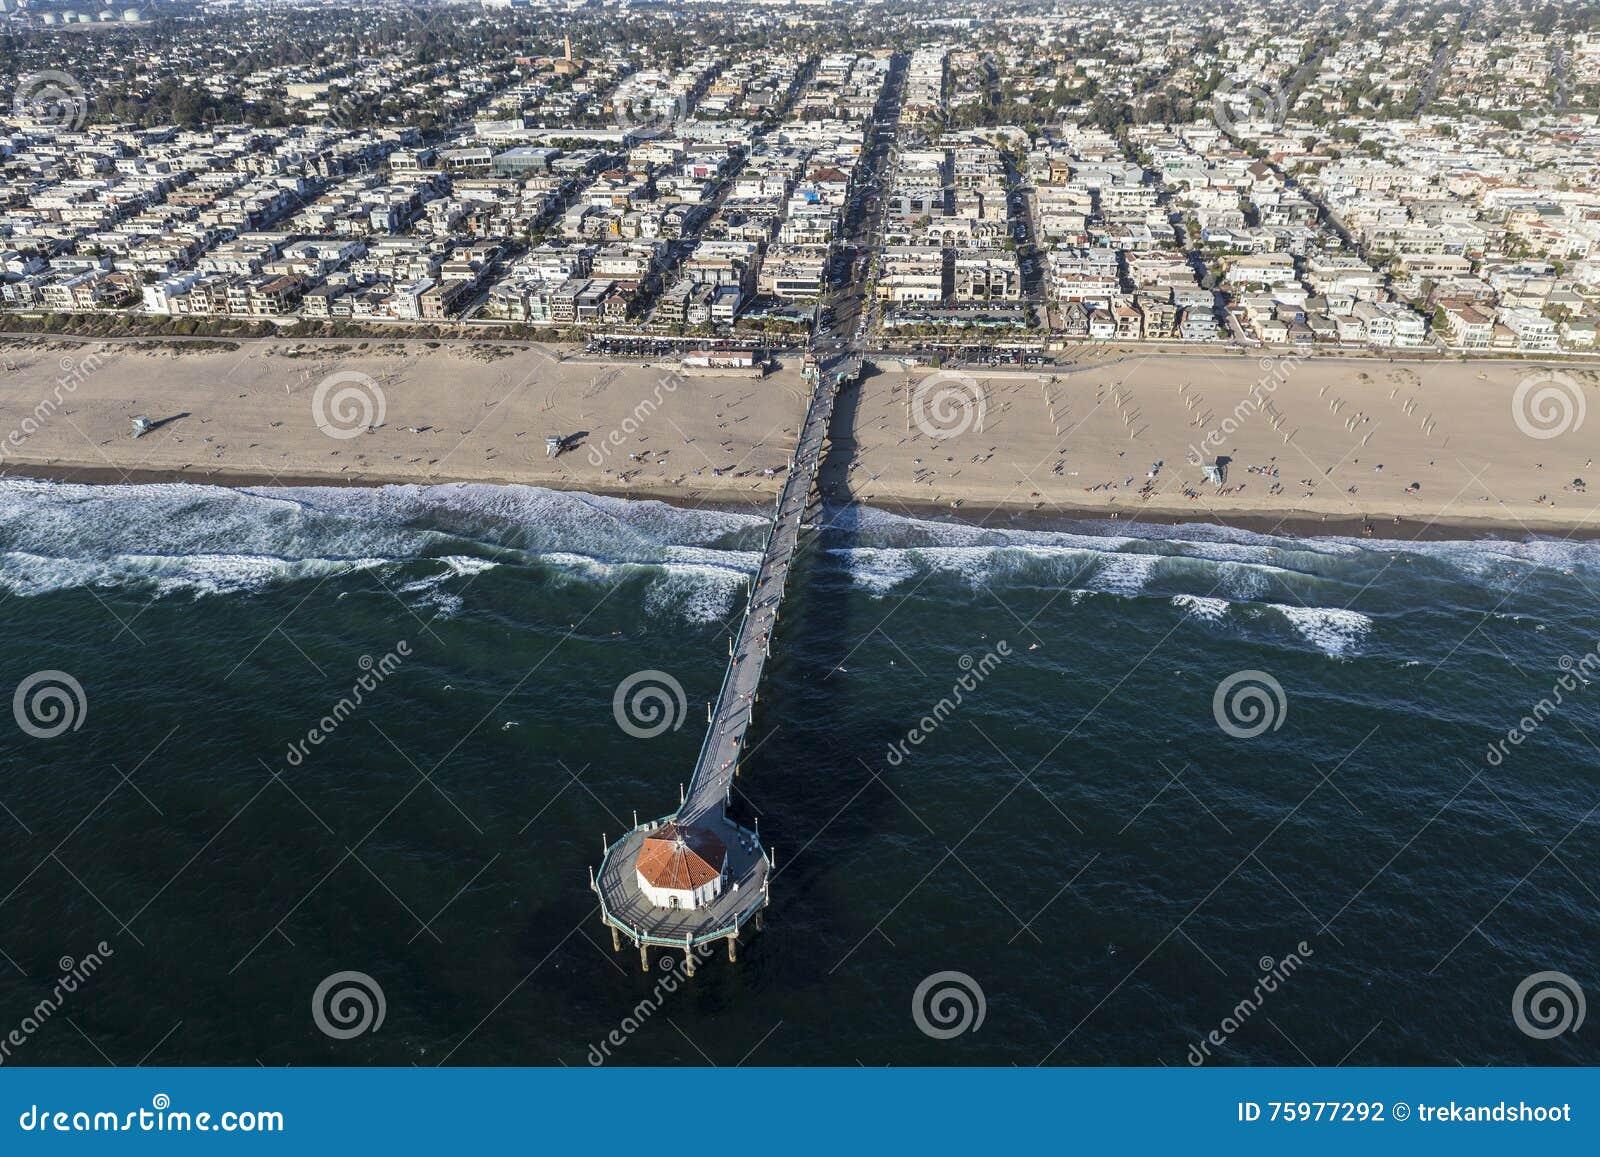 Manhattan Beach Pier Aerial Stock Photo Image Of Ocean Manhattan